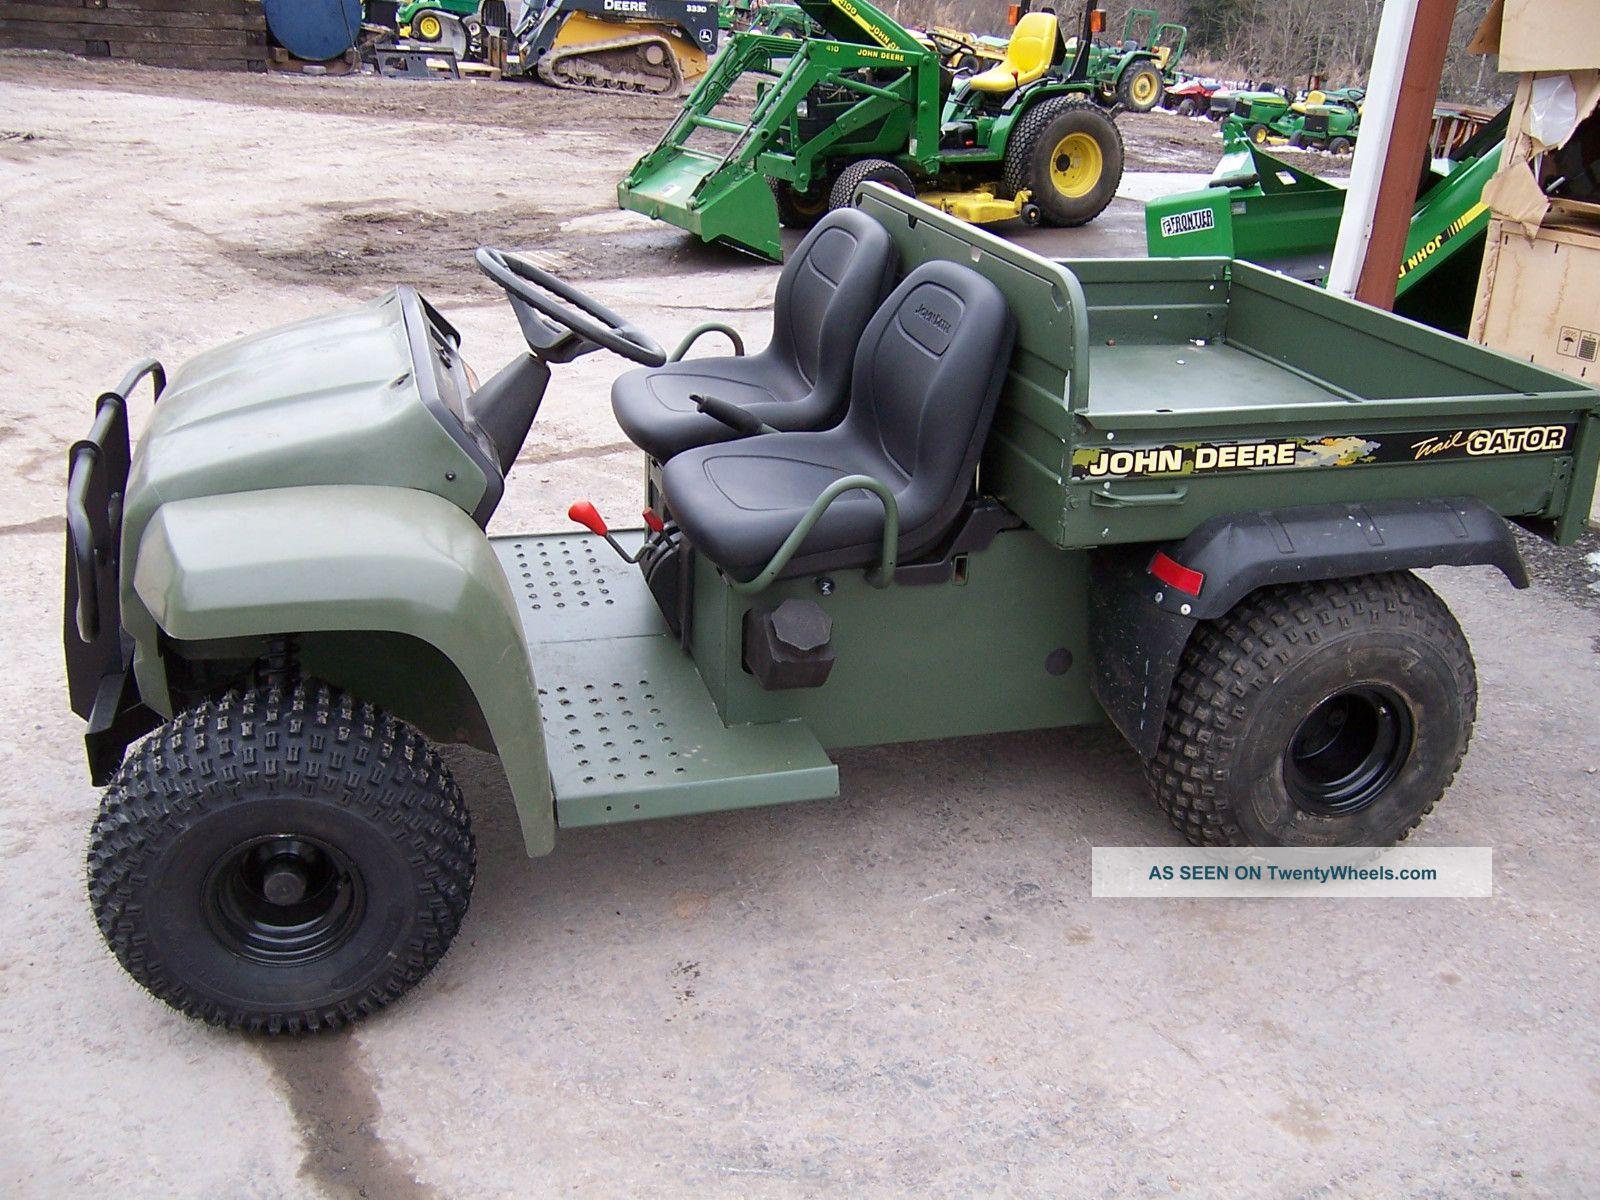 John Deere 4x2 Trail Gator Utility Vehicles photo